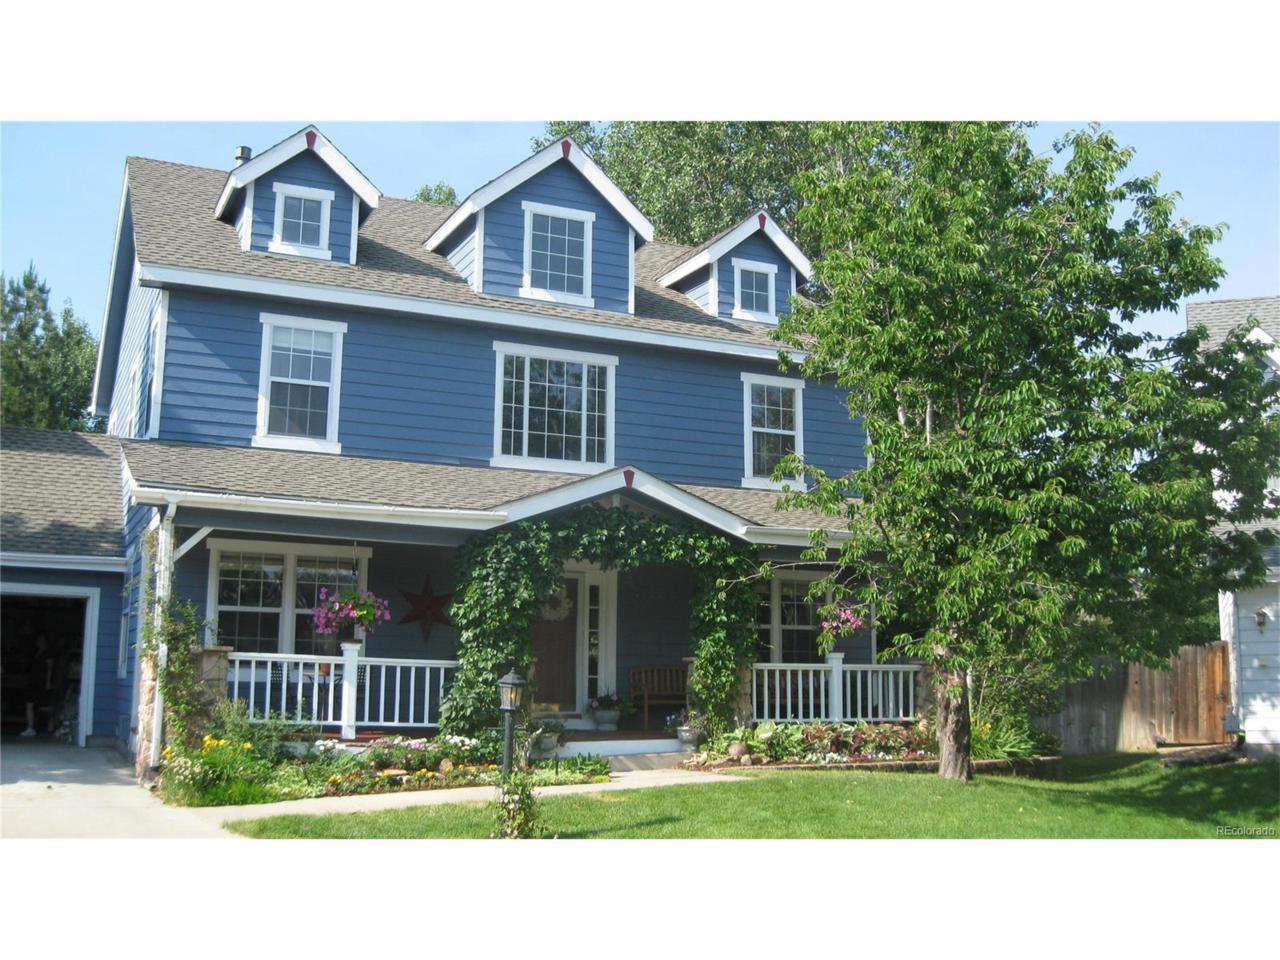 12895 S Crazy Horse Court, Parker, CO 80134 (MLS #7197891) :: 8z Real Estate